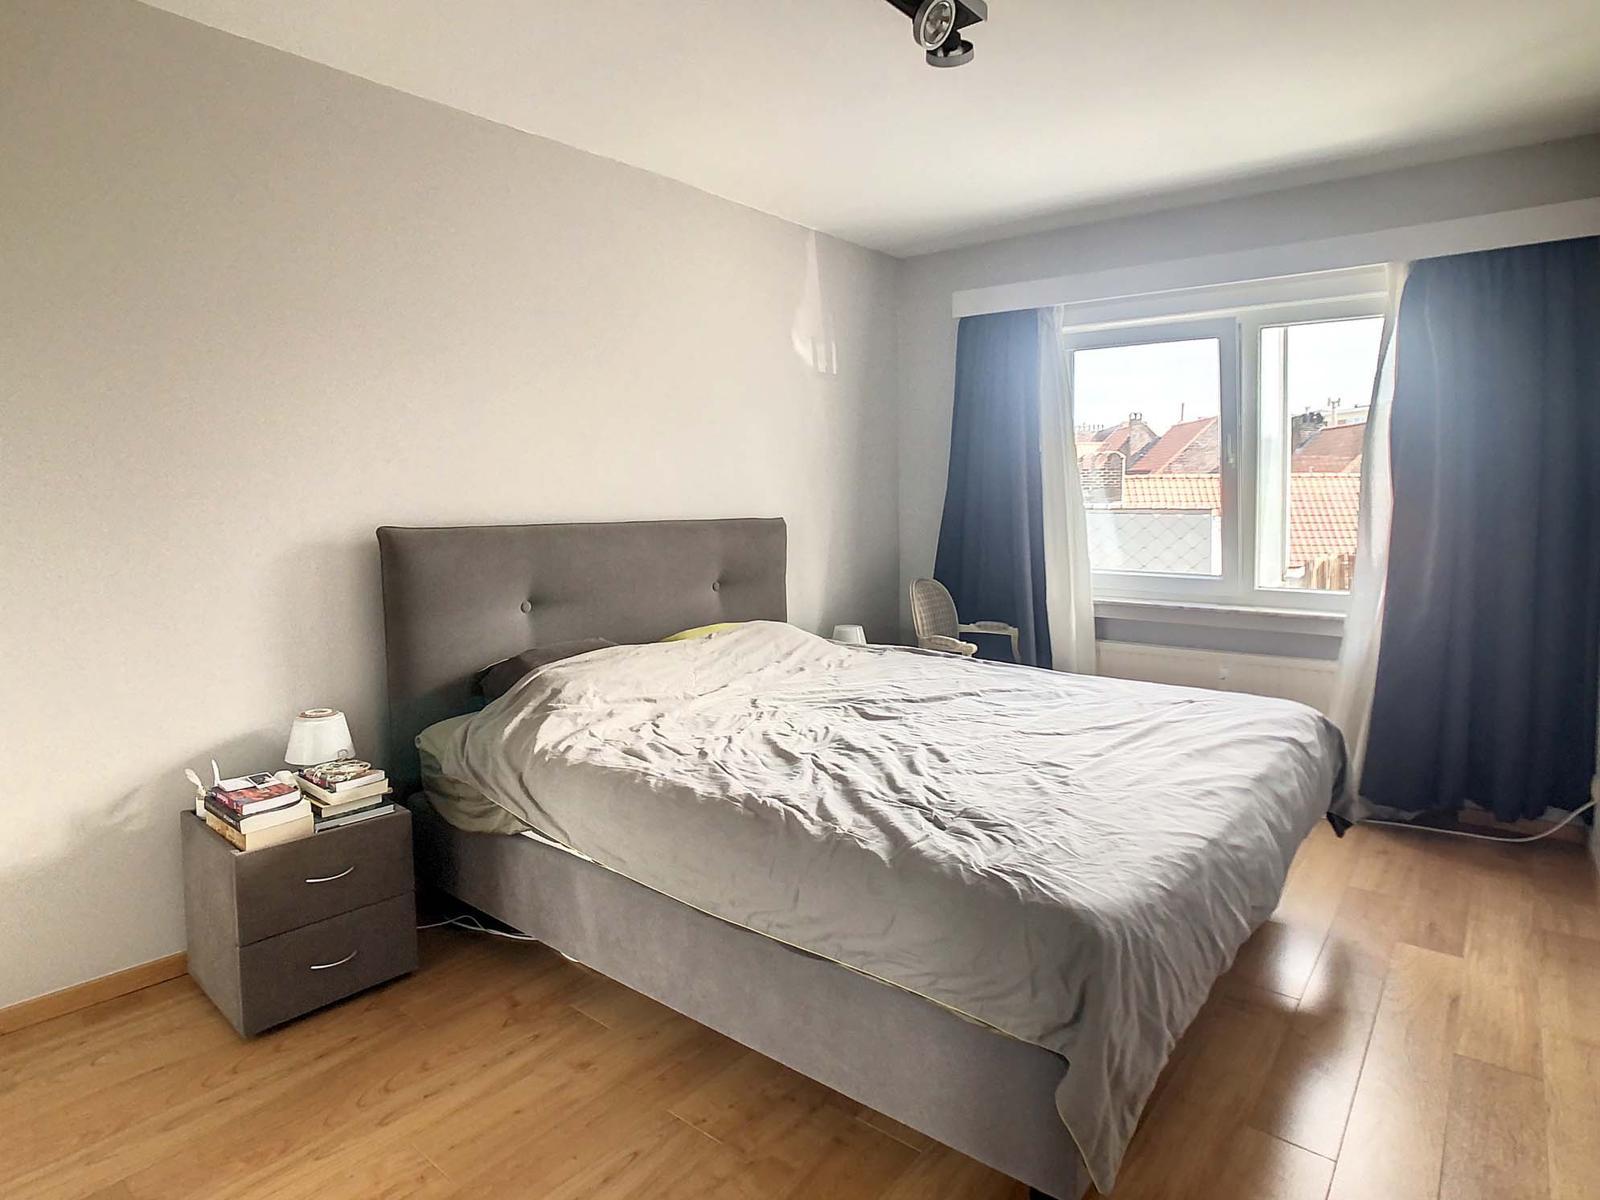 Appartement - Woluwe-Saint-Lambert - #4521382-5